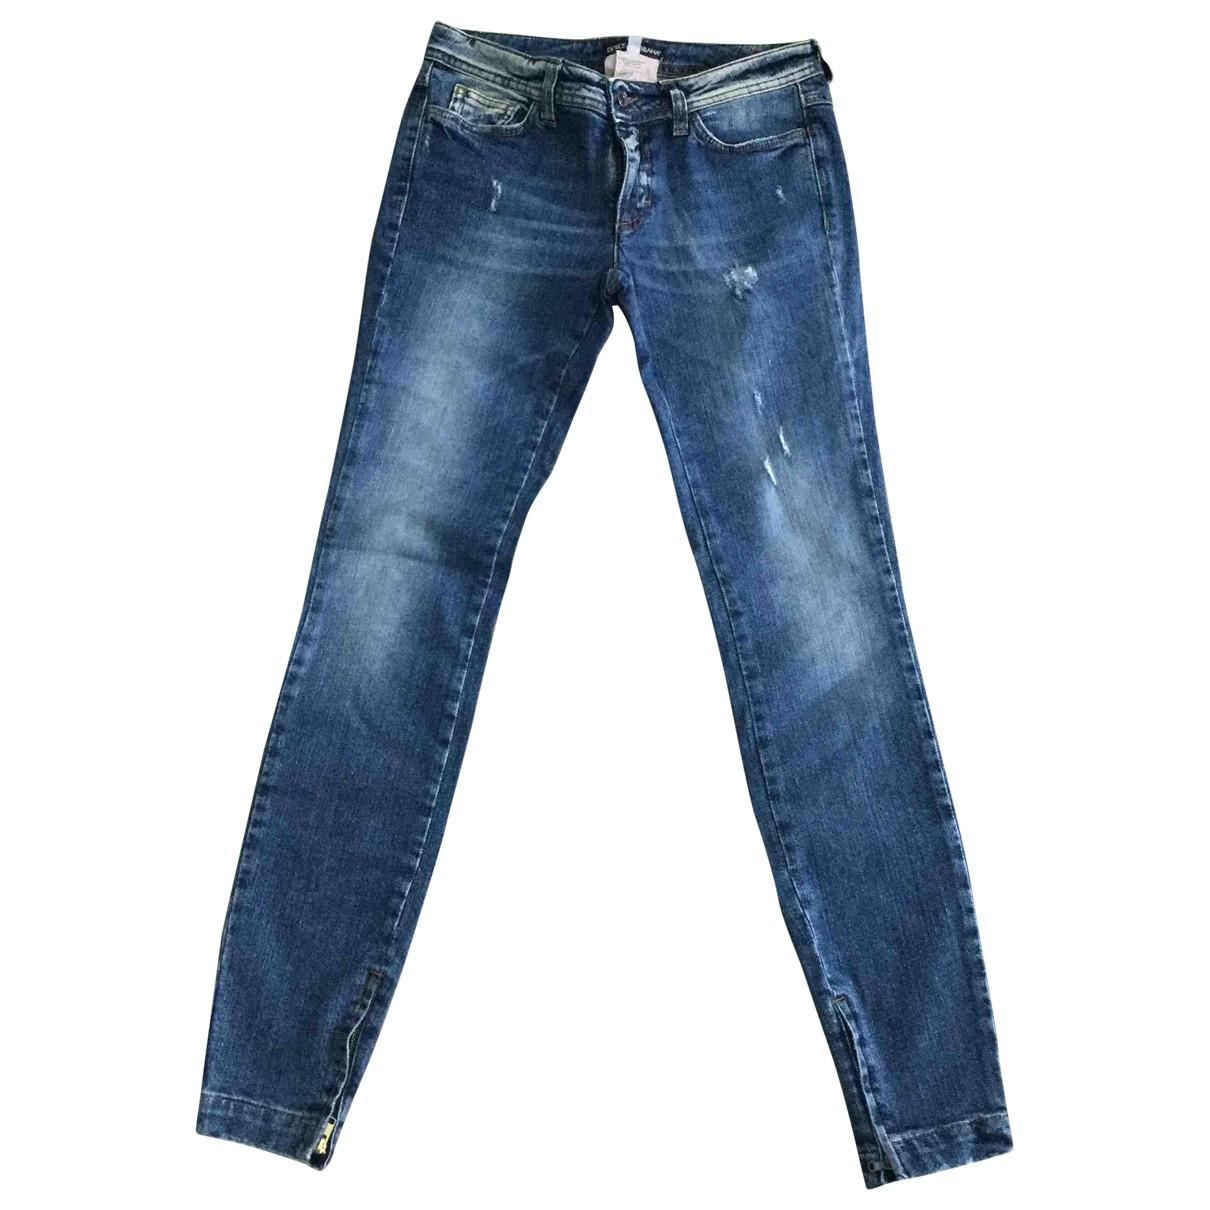 Dolce & Gabbana \N Navy Cotton - elasthane Jeans for Women 34 FR